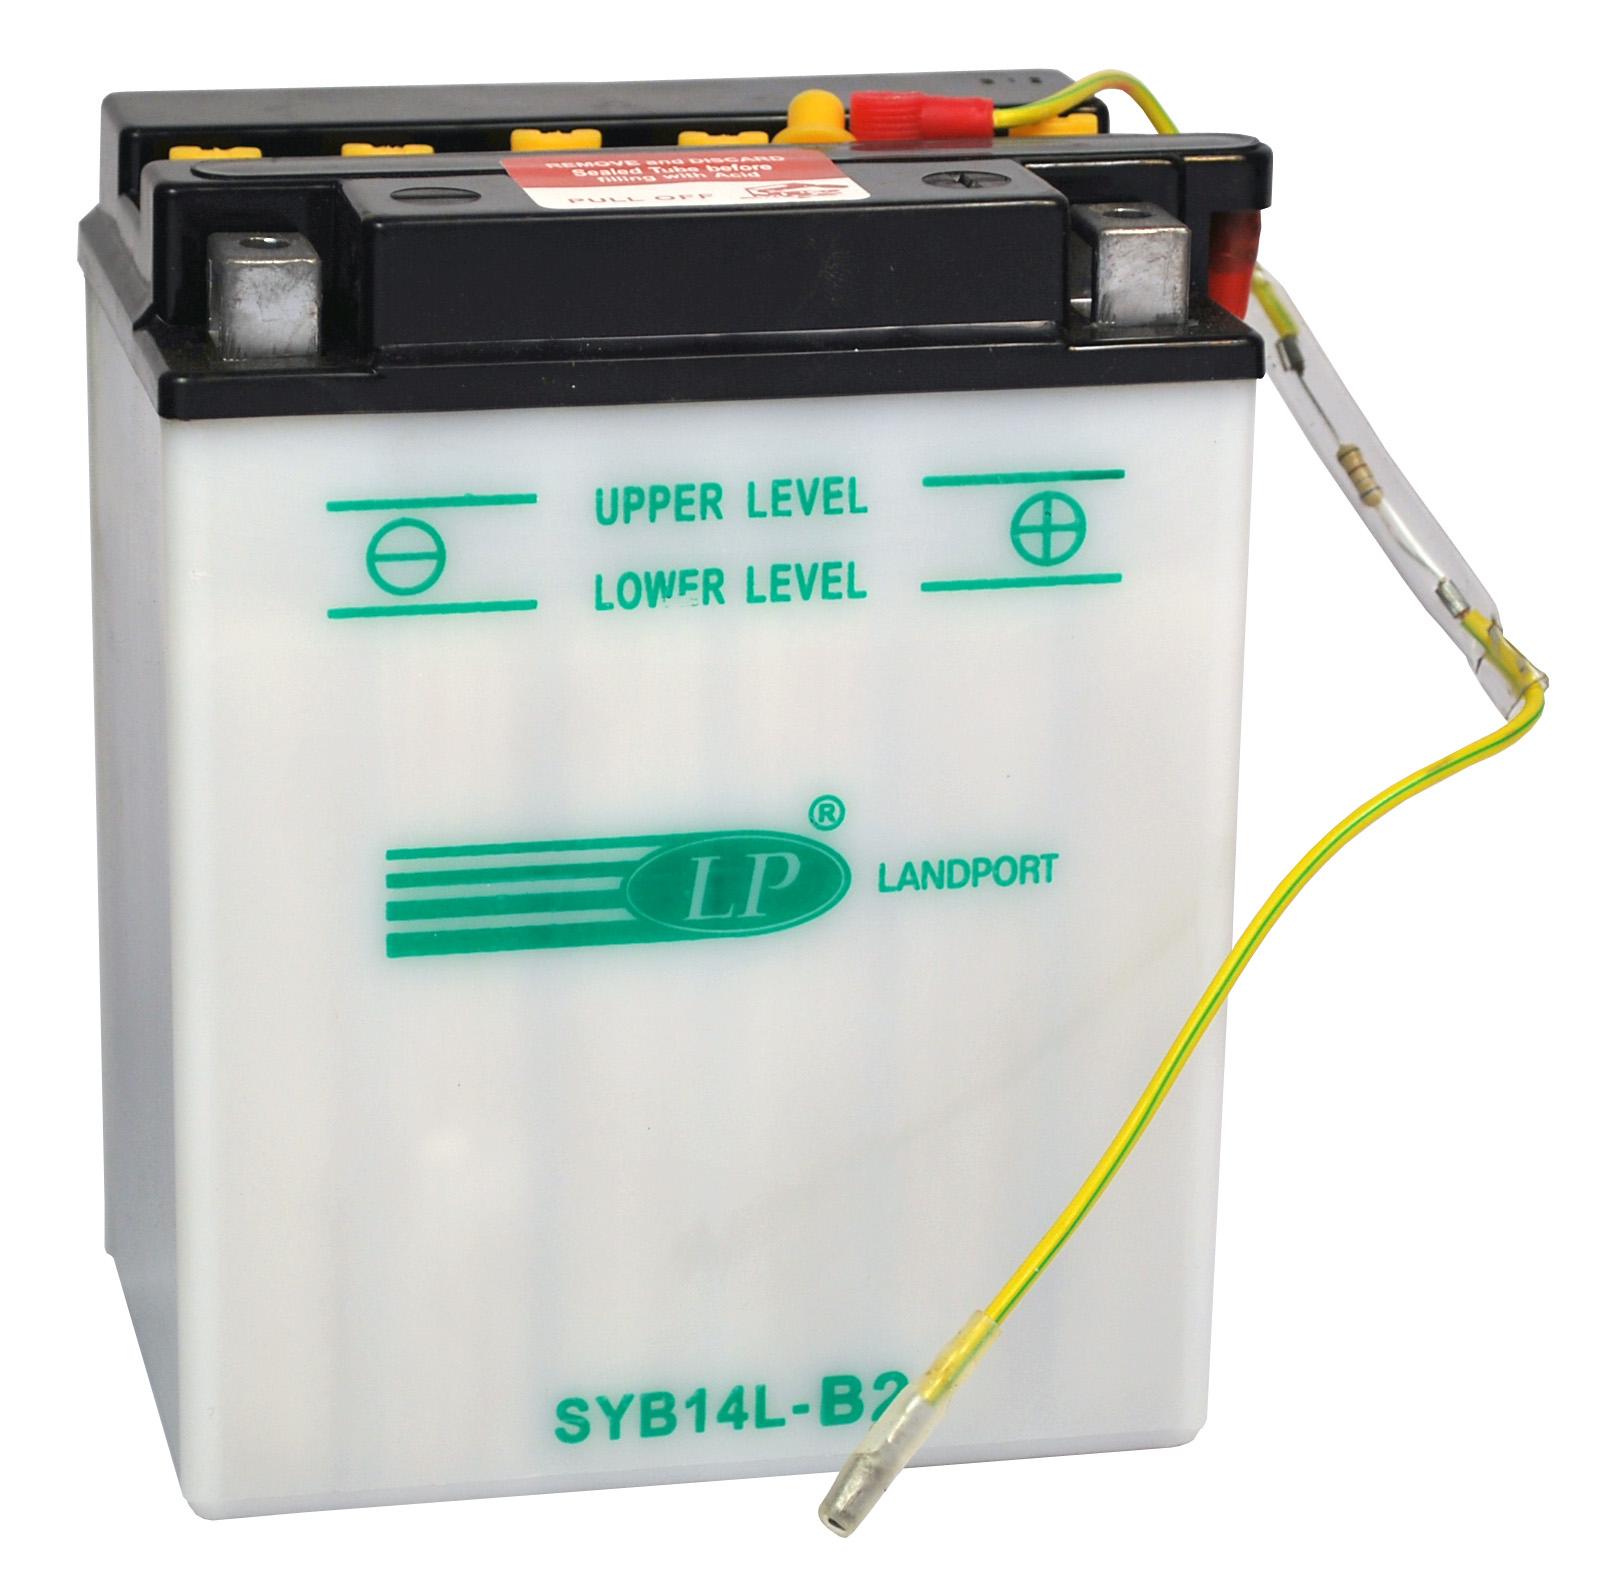 SYB14L-B2 motor accu zonder zuurpakket